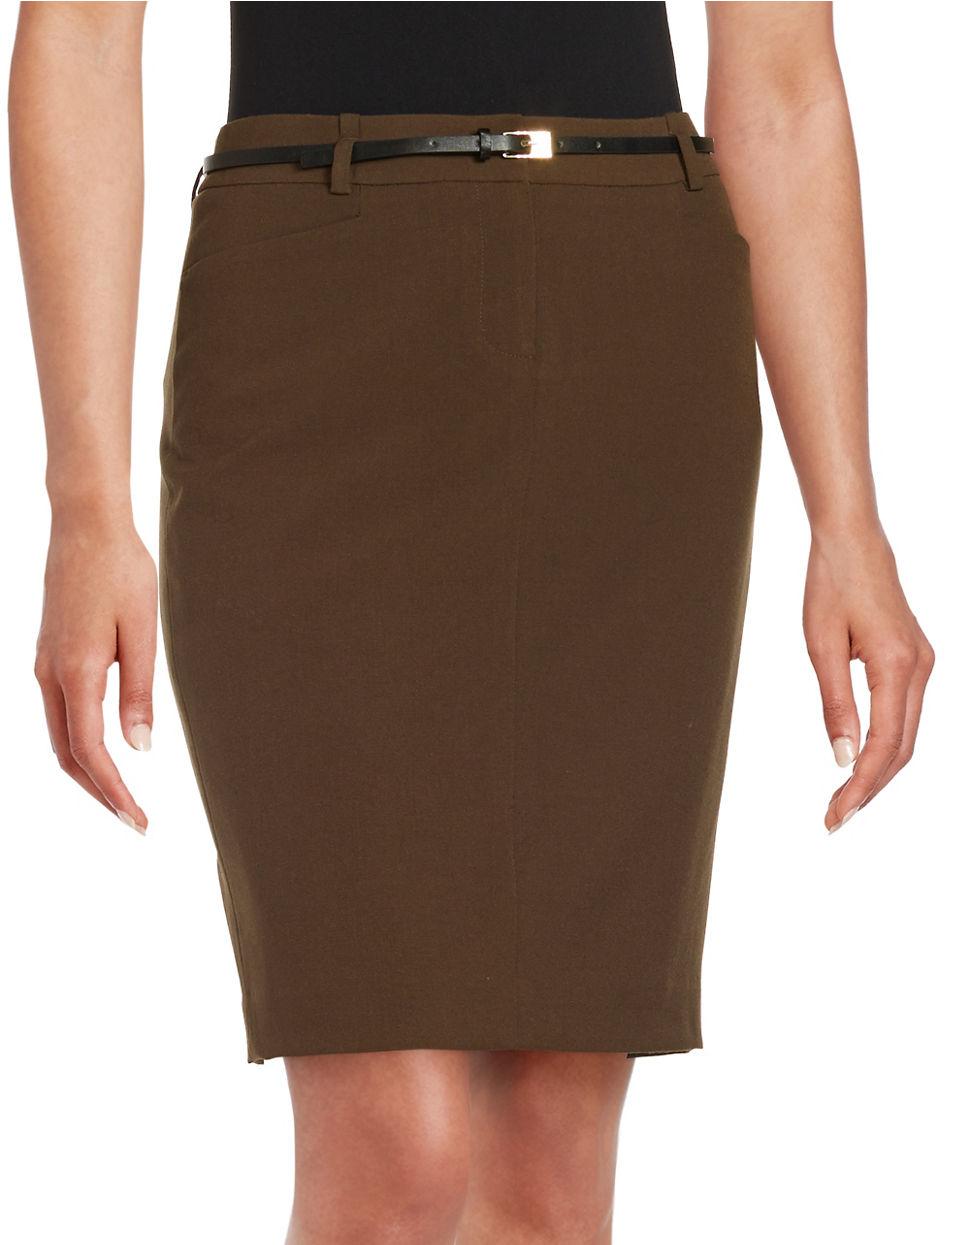 calvin klein belted pencil skirt in brown lyst